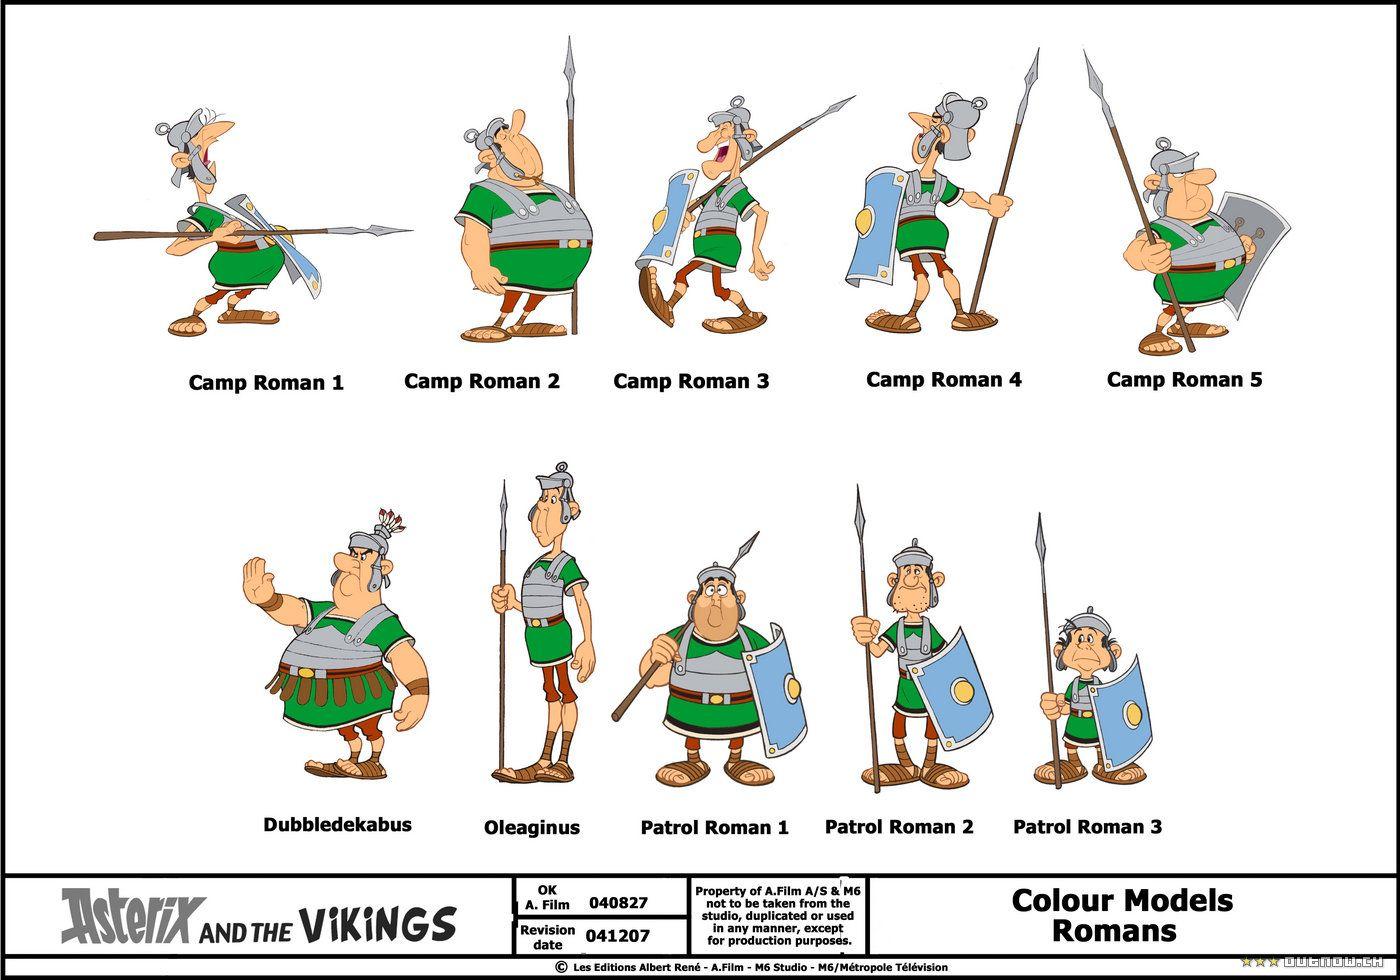 Tim Struppi 3 Gratis Malvorlage In Comic: Astérix Et Les Vikings - Romains